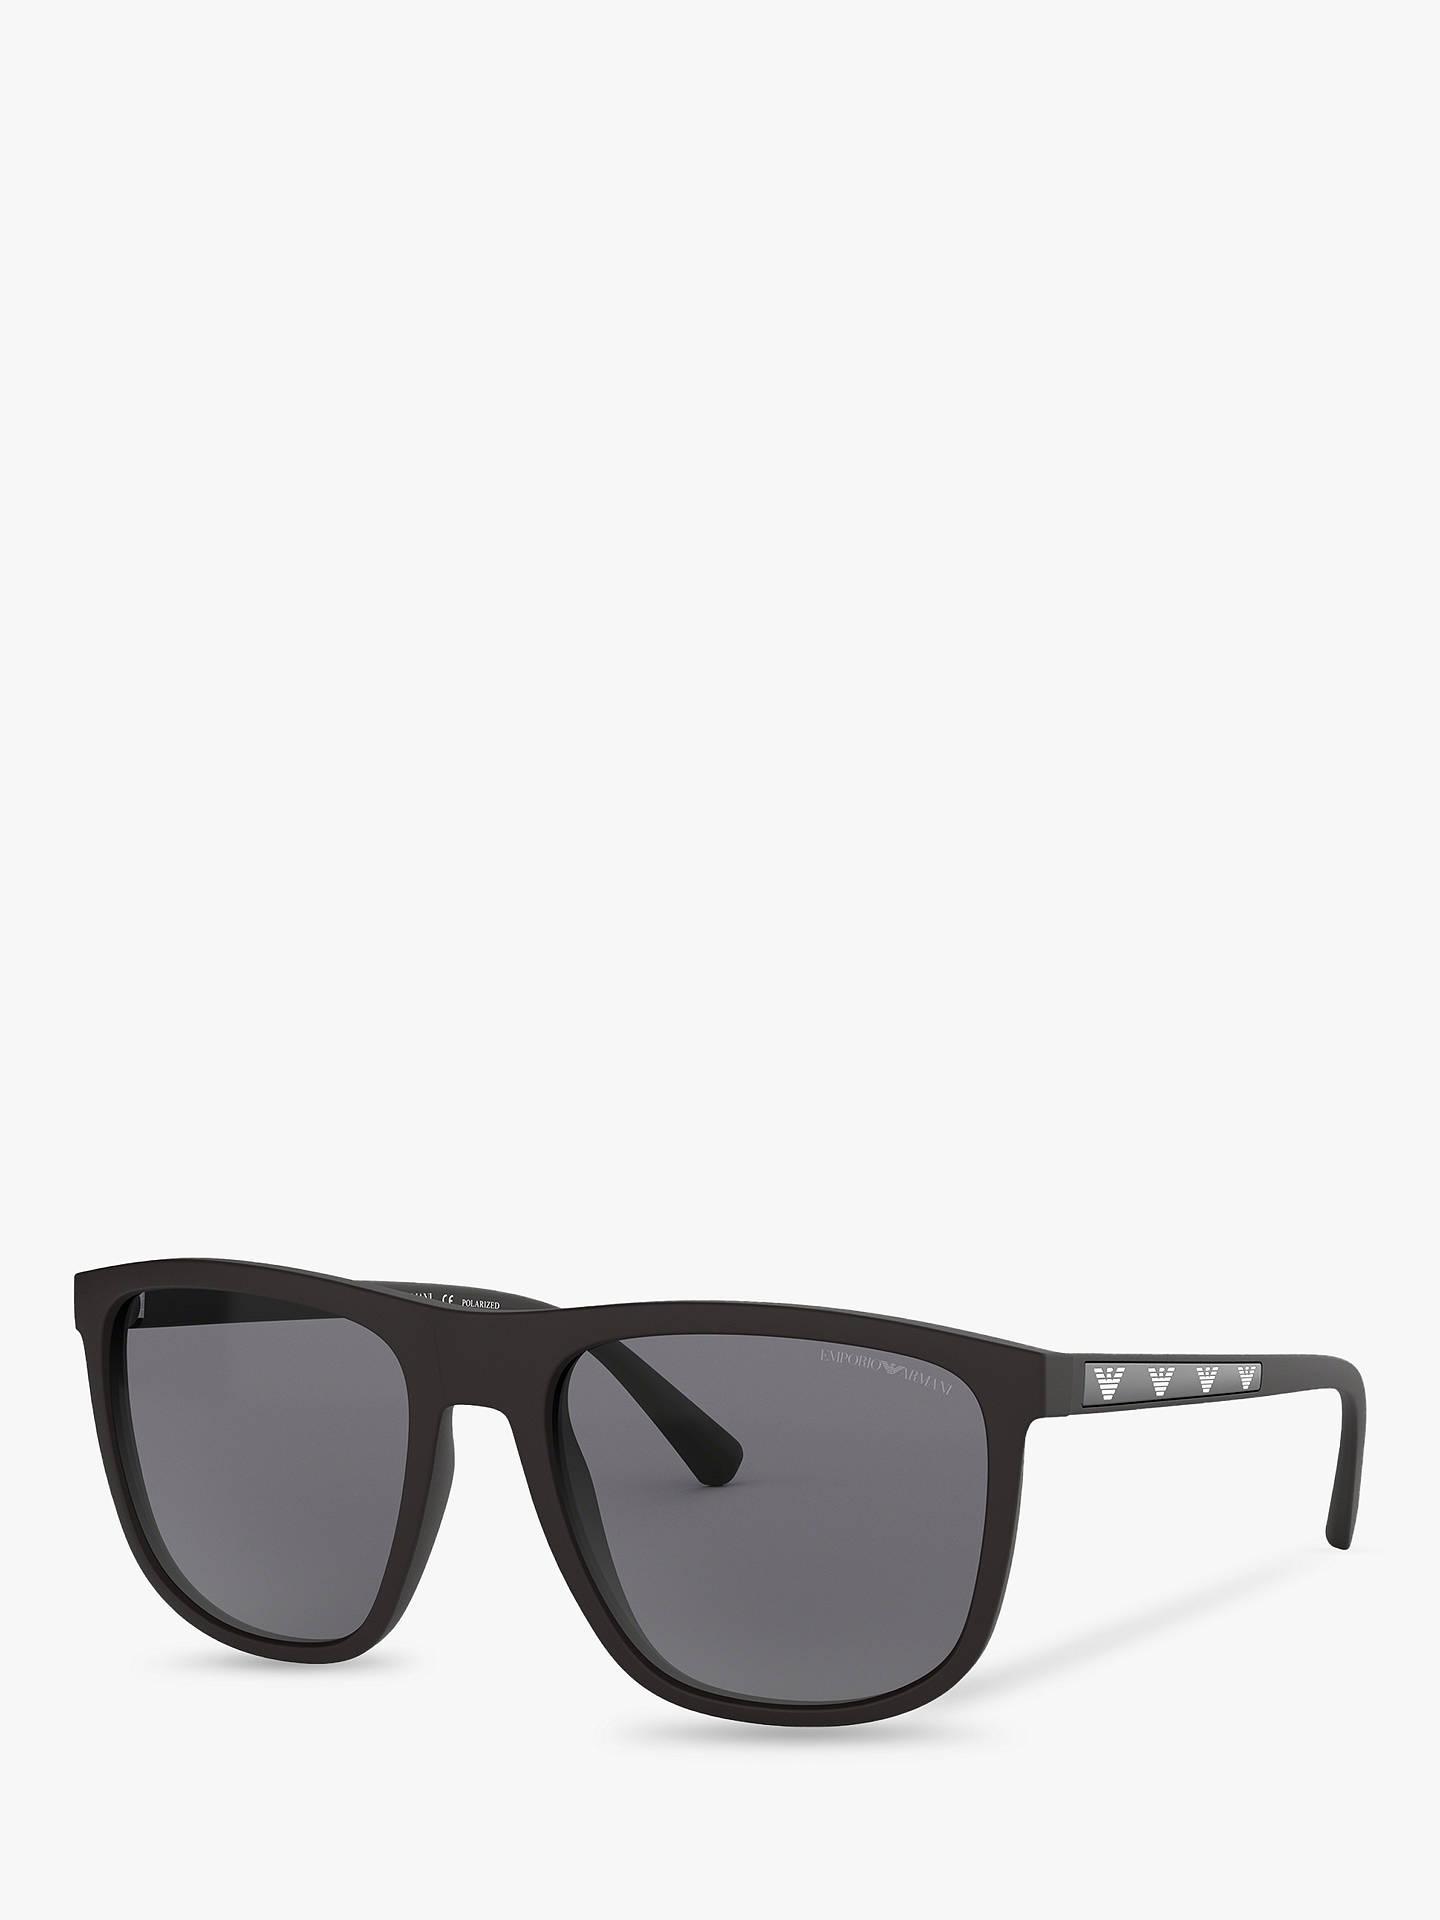 c90829878e9 Emporio Armani EA4123 Men s Square Sunglasses at John Lewis   Partners